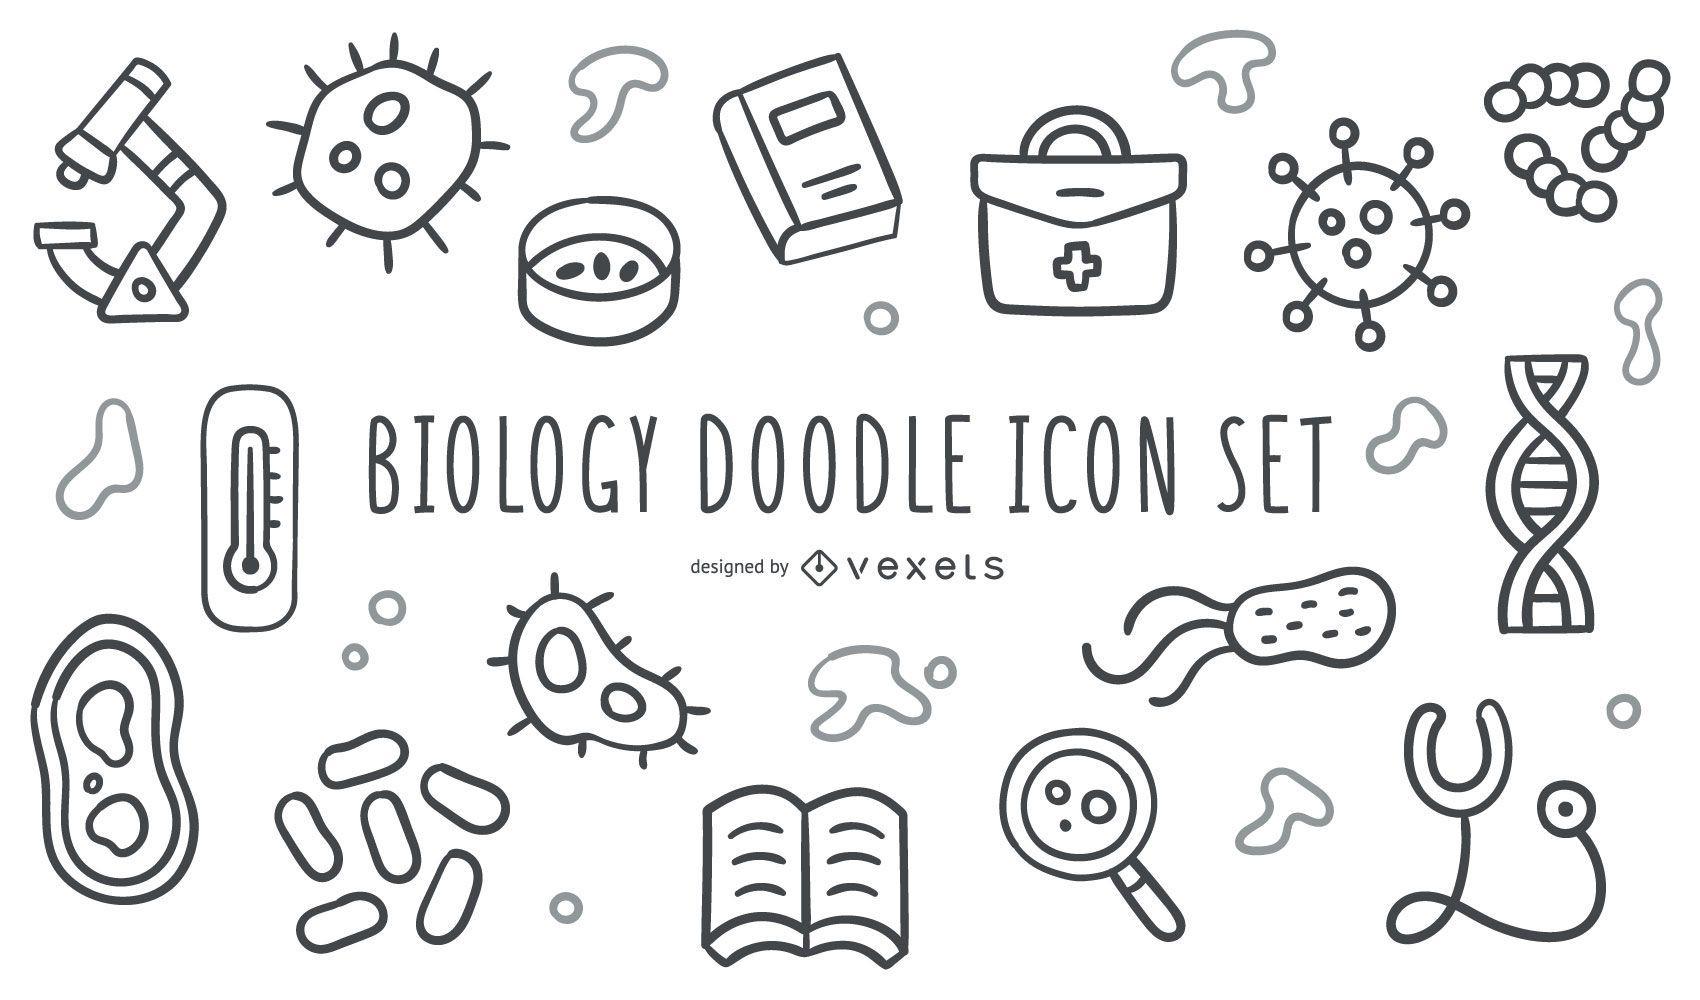 Biology doodle icon set